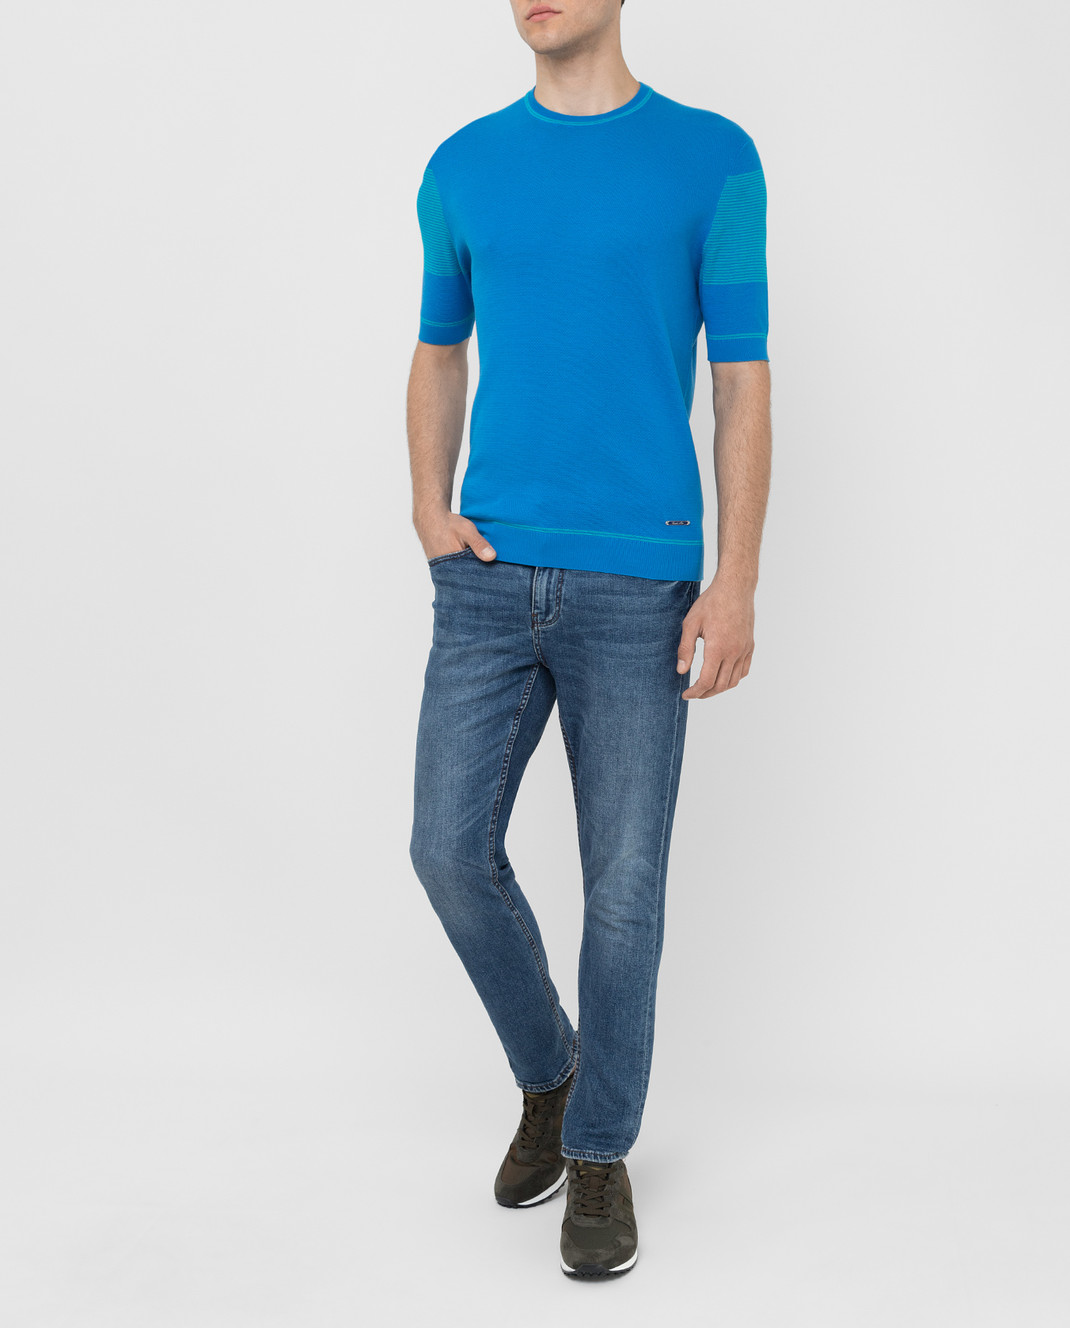 Castello d'Oro Синяя футболка изображение 2